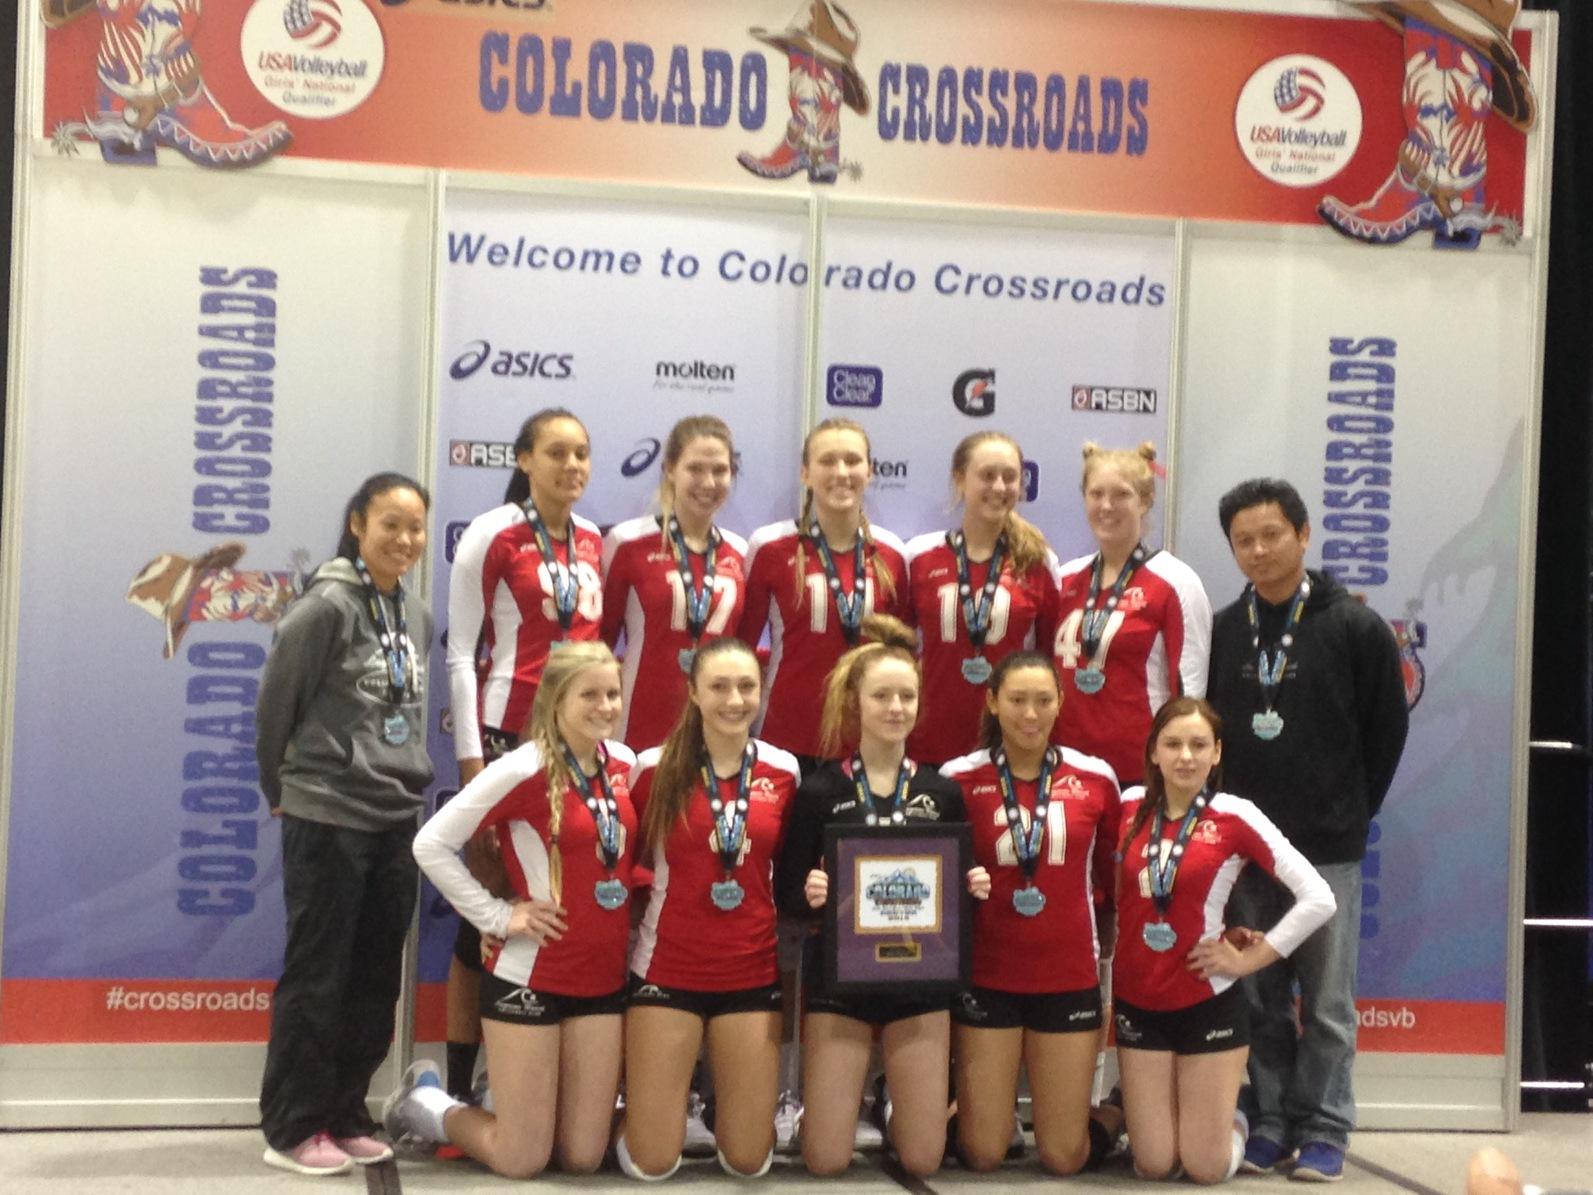 17-Tuan Colorado Crossroads Qualifier Silver Medalists